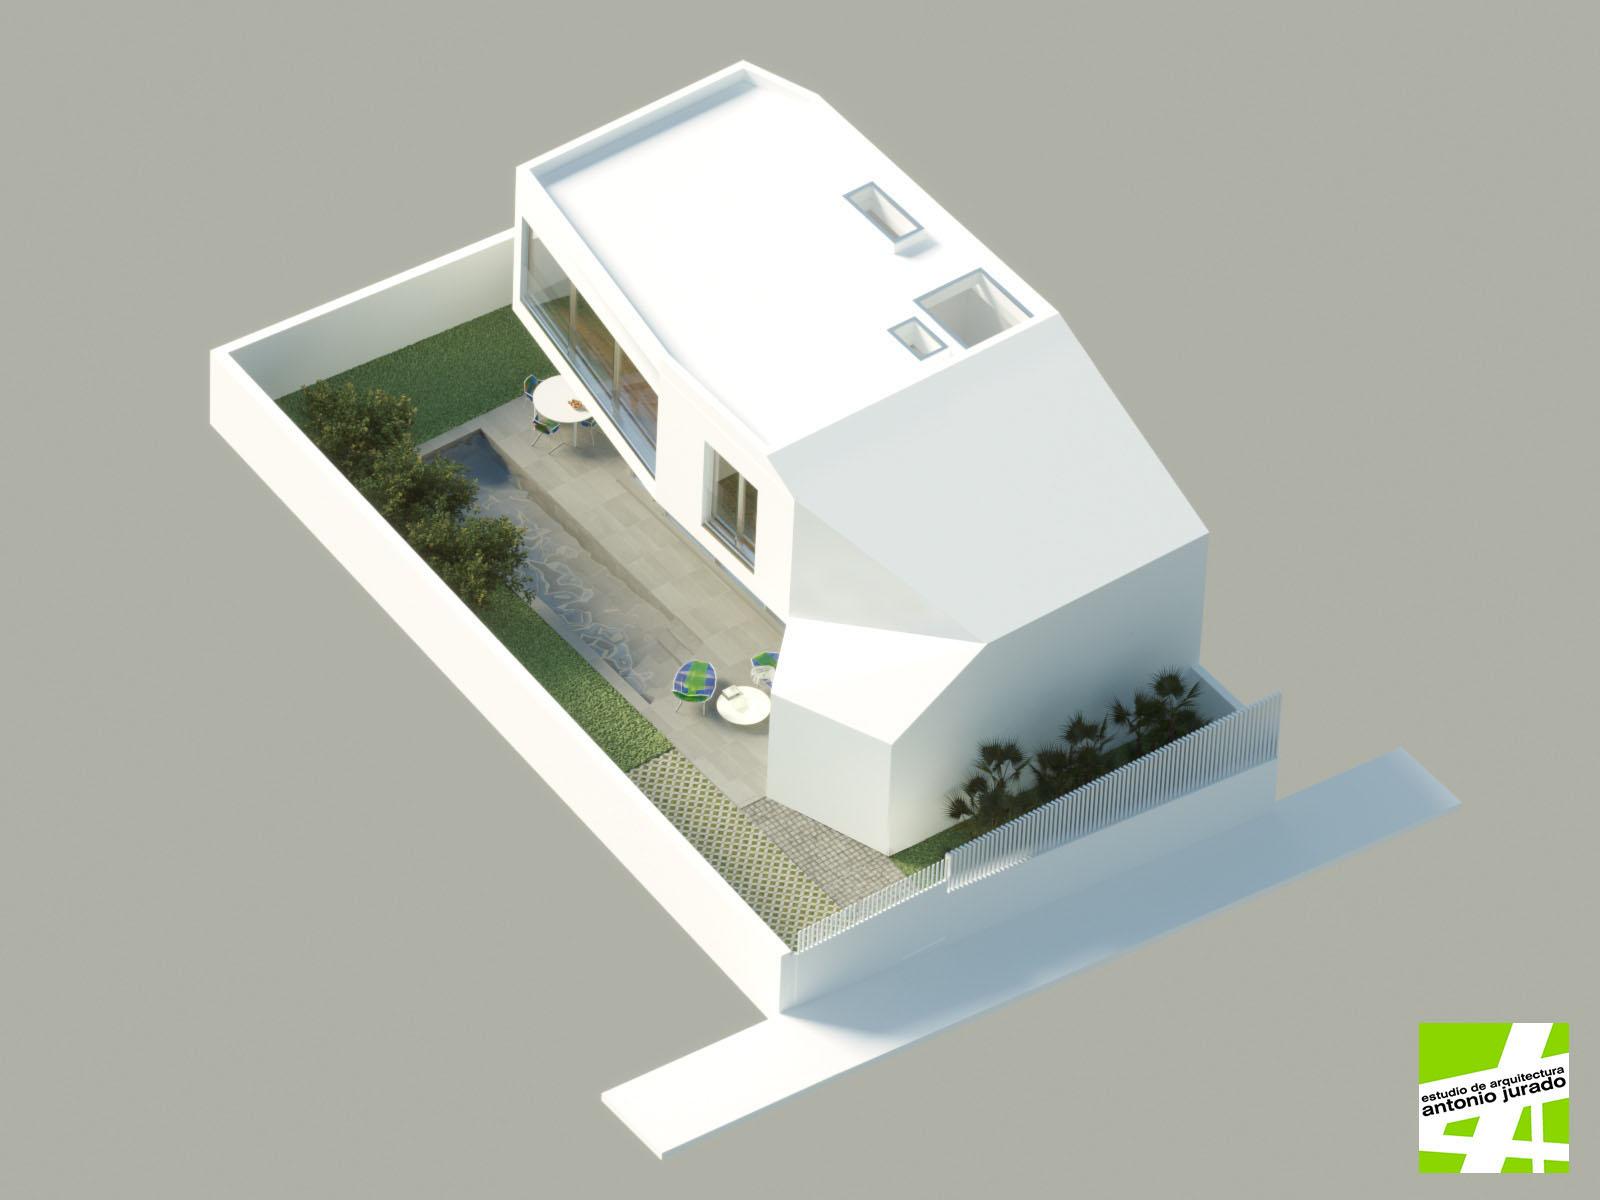 casa-ob-house-alhaurin-malaga-arquitecto-antonio-jurado-10